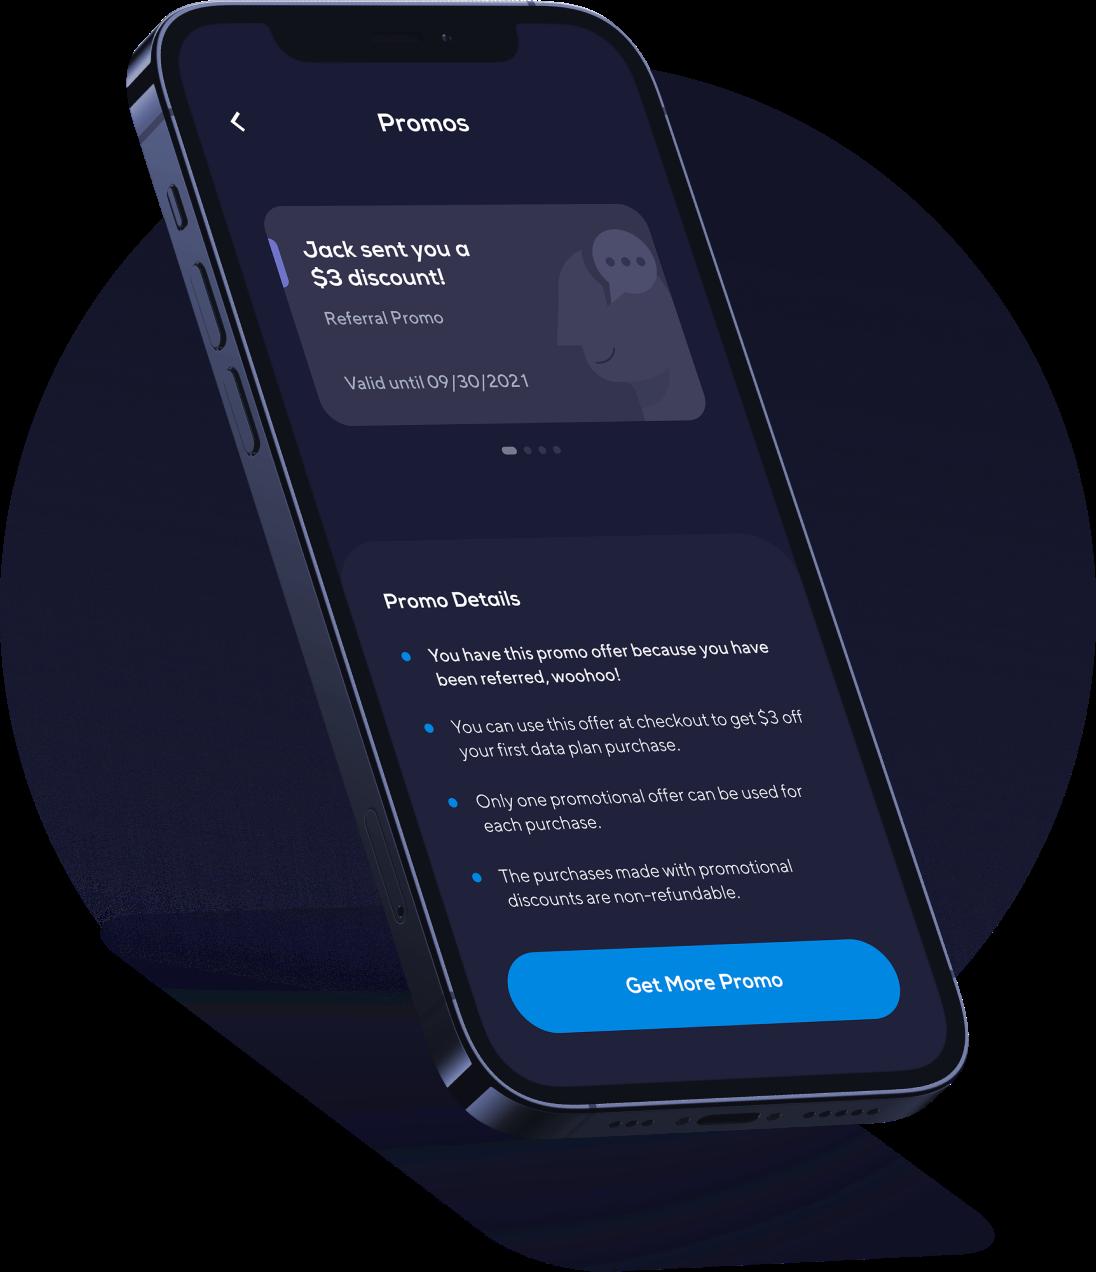 digital nomad, connectivity, eSIM, data plan, prepaid data, roaming data, travel data, roaming